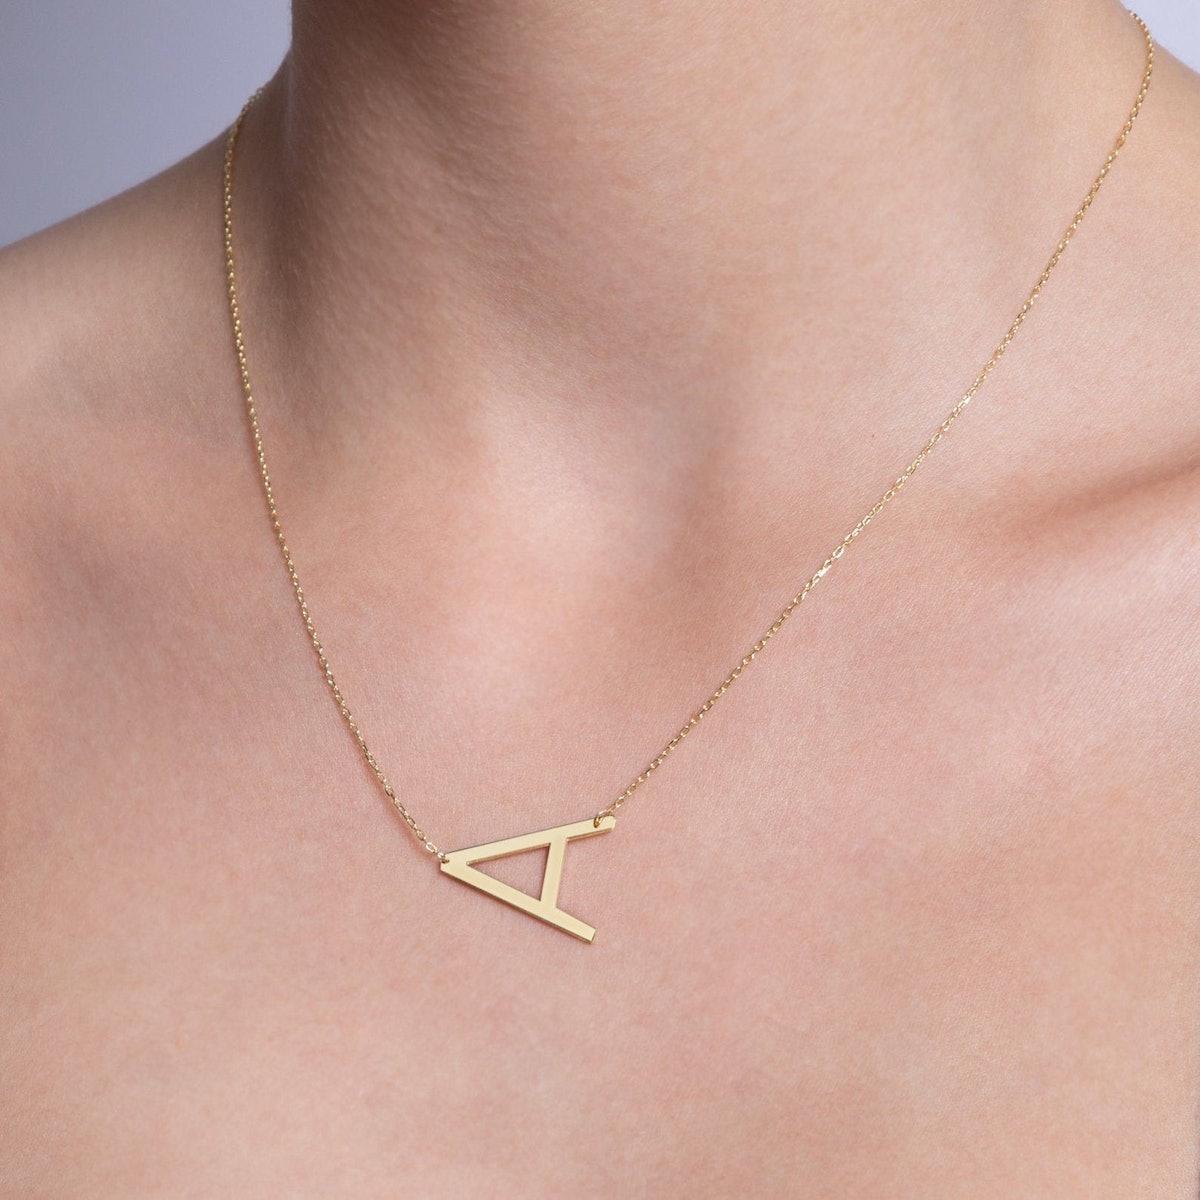 Sideways Initial Necklace